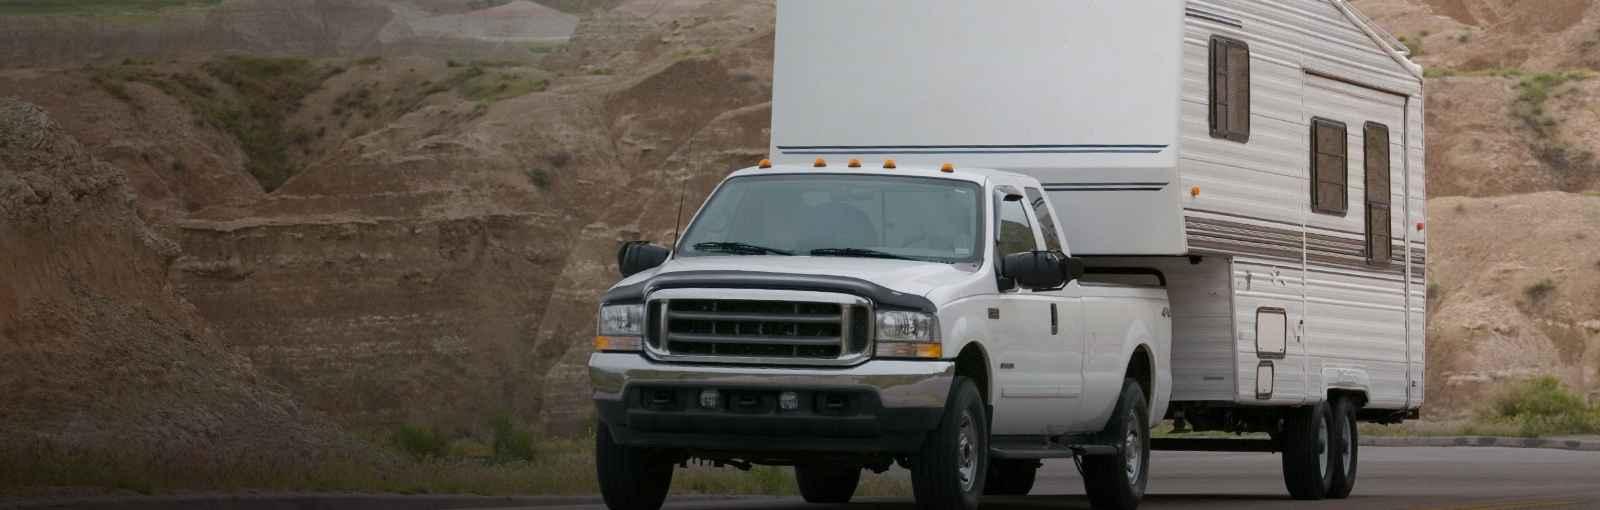 Truck Accessories - RV Part Shop USA